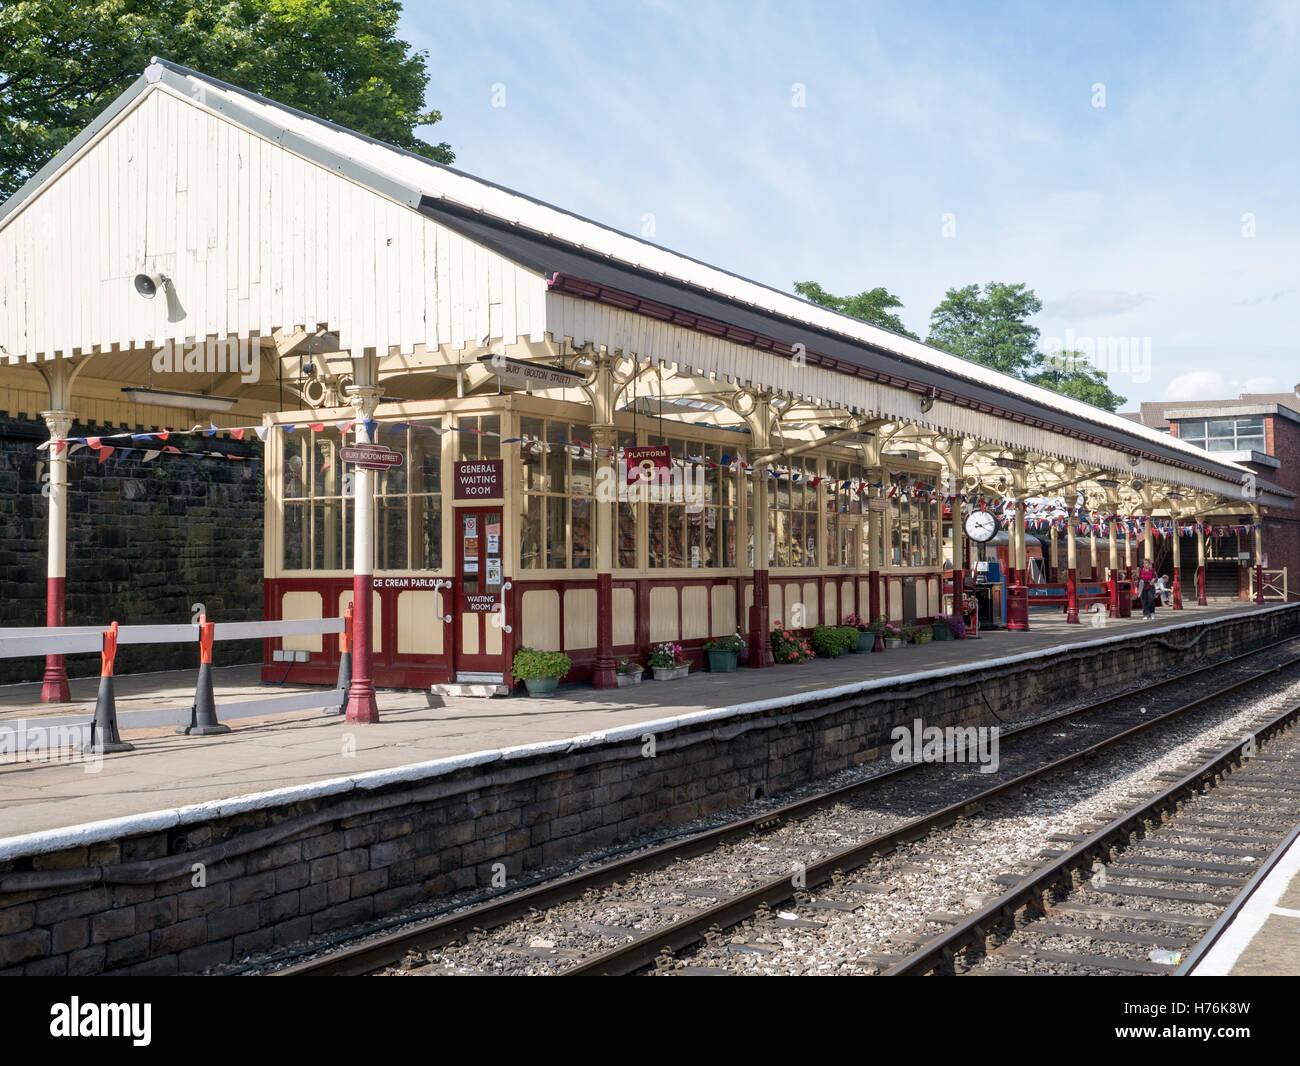 Classic railway station at Bolton Street, Bury, Lancashire - Stock Image